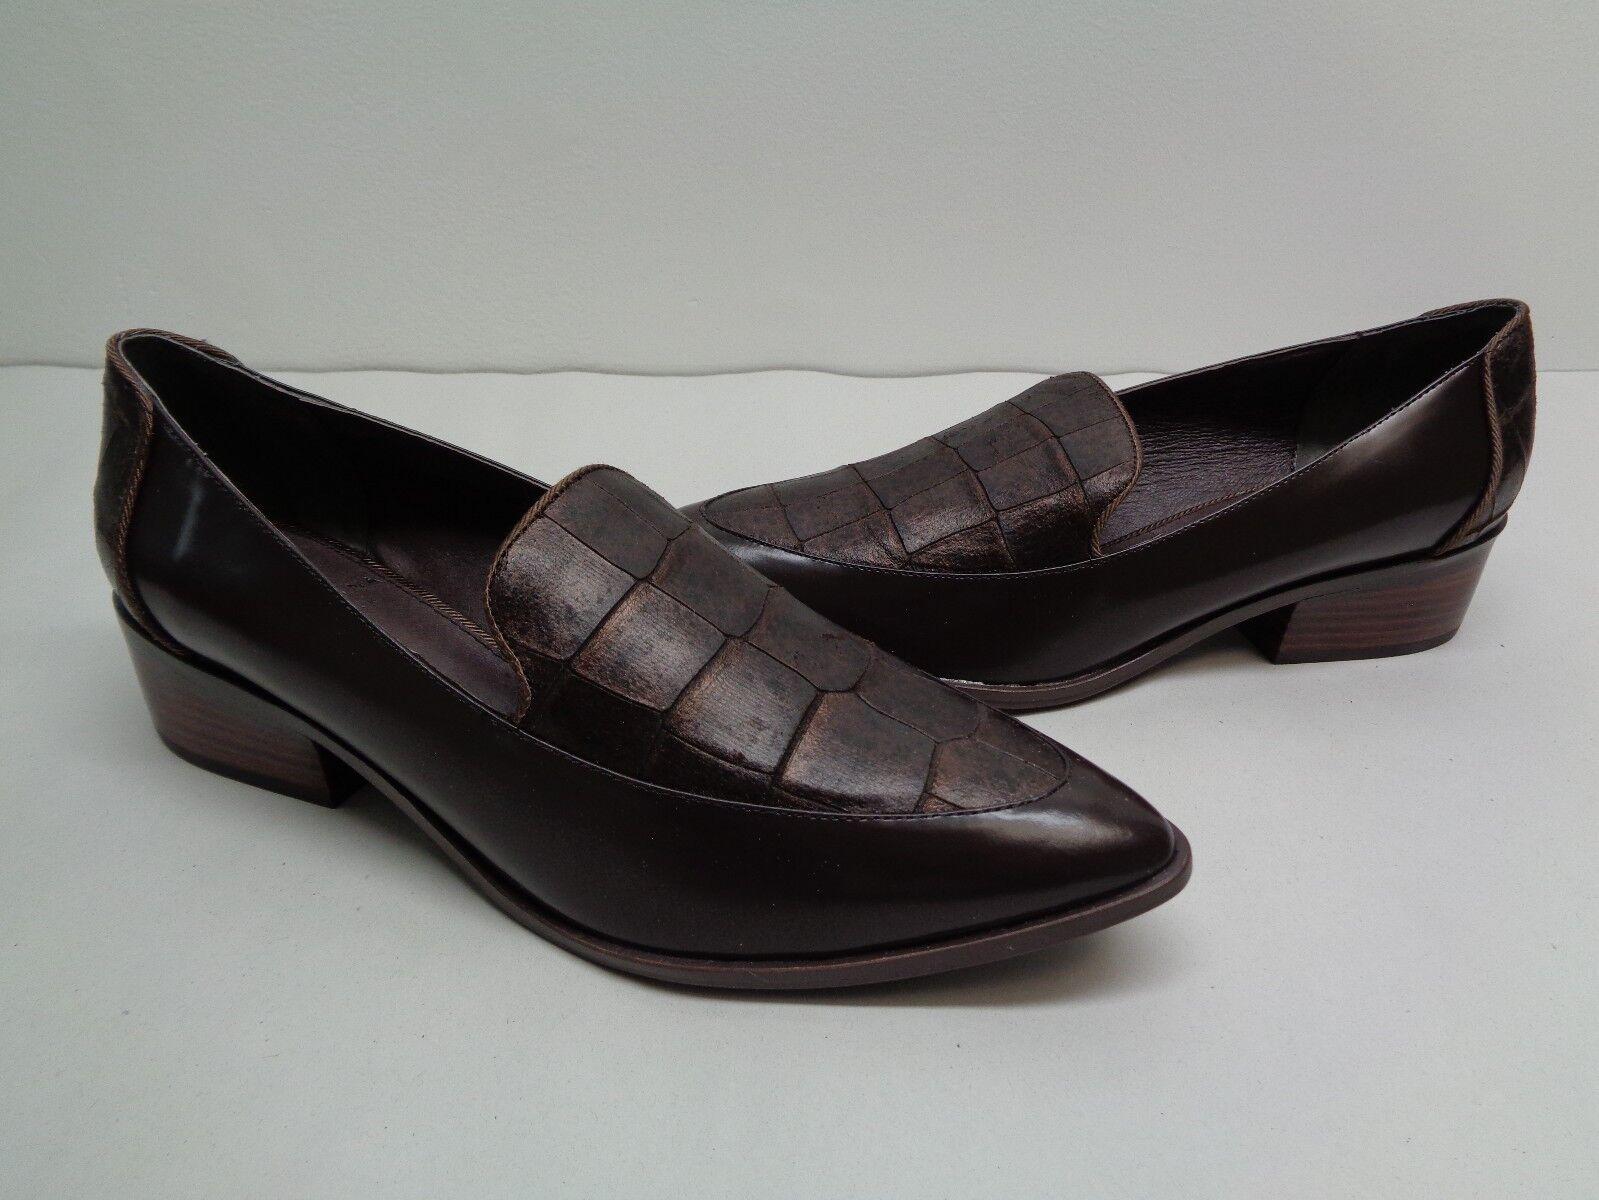 Adrianna Papell Größe 7.5 M KANE Braun Leder Loafers Oxfords NEU Damenschuhe Schuhes